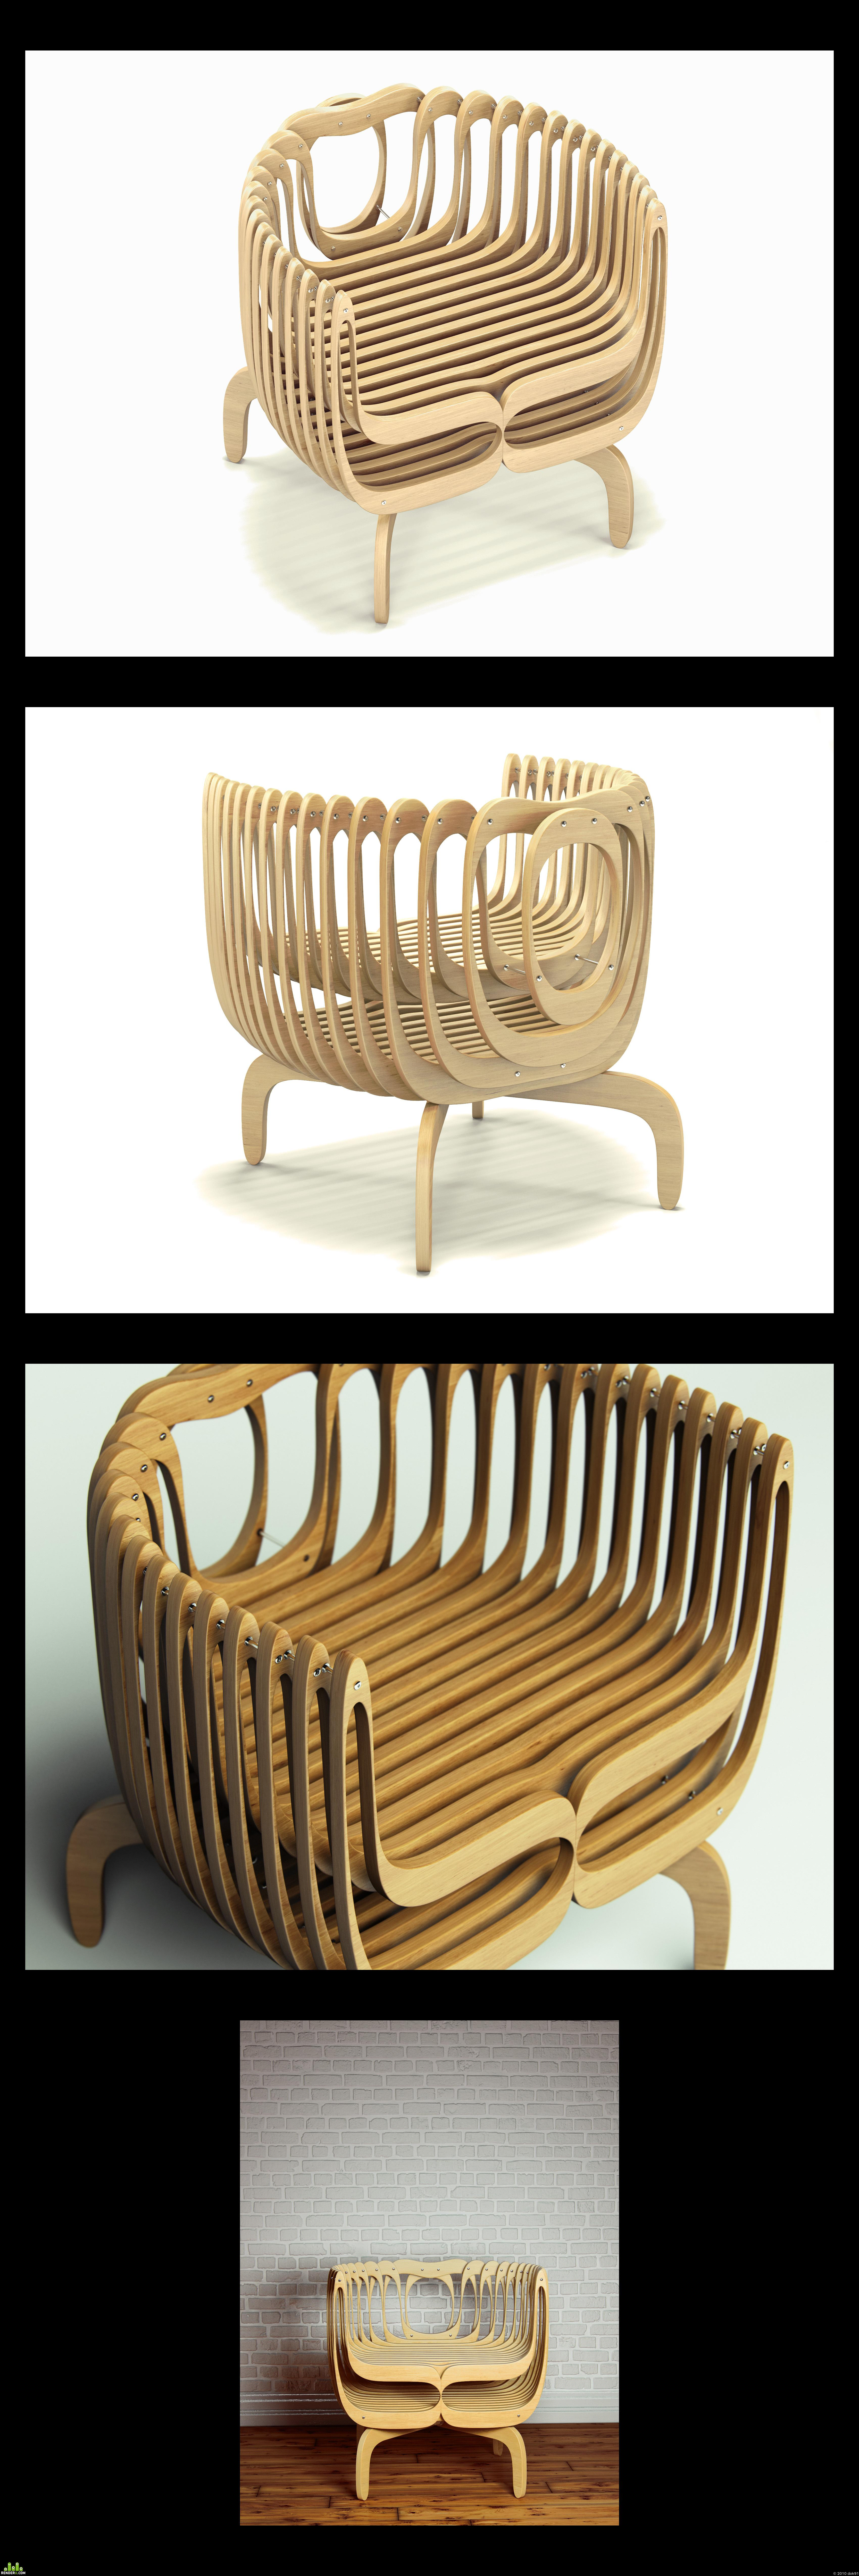 preview Rapigattoli chair